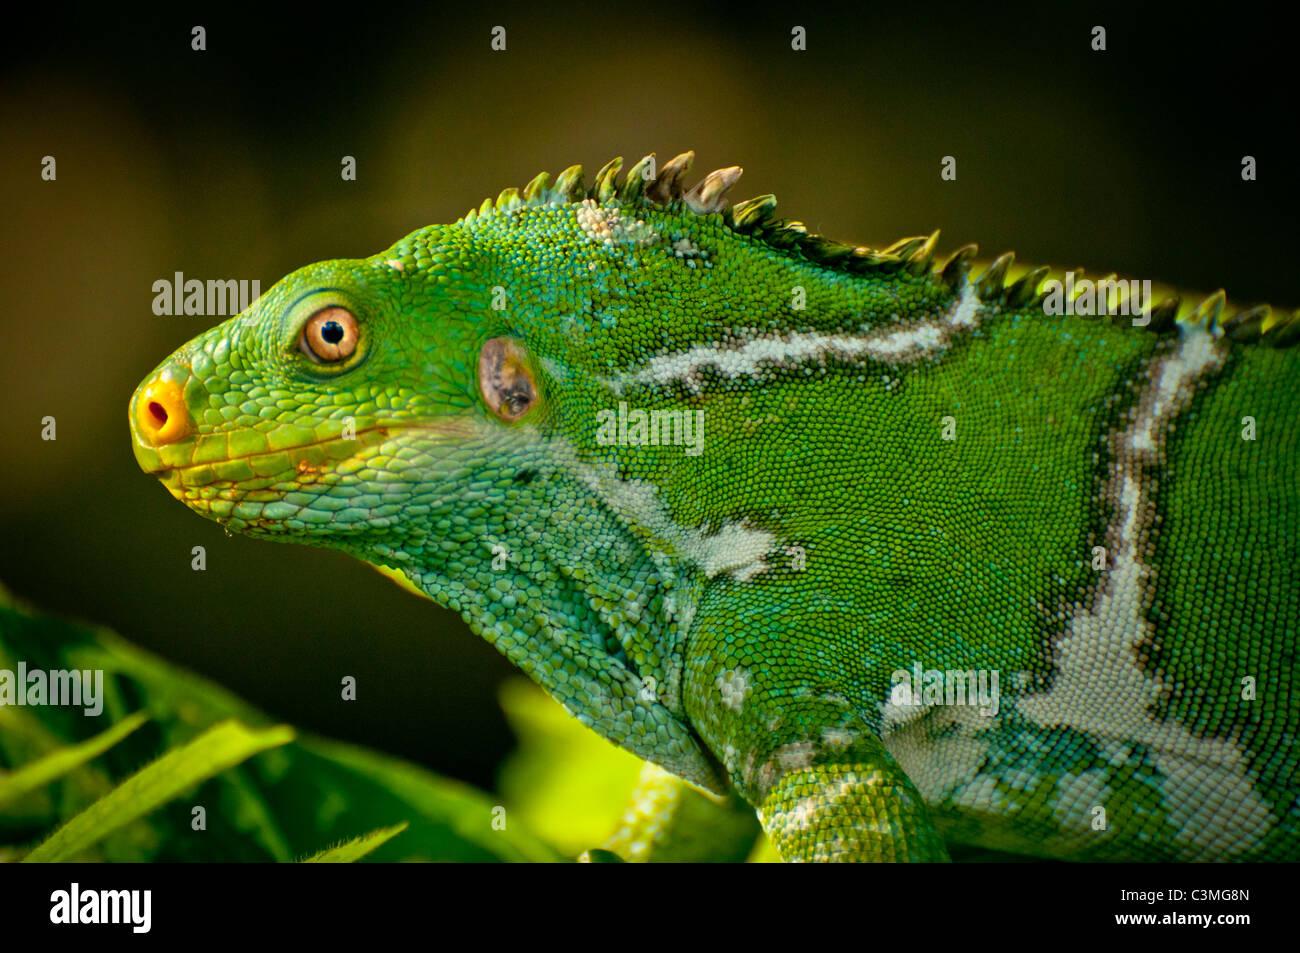 Crested Iguana, Kula Eco Park, Sigatoka Coral Coast, Viti Levu, Fiyi Imagen De Stock